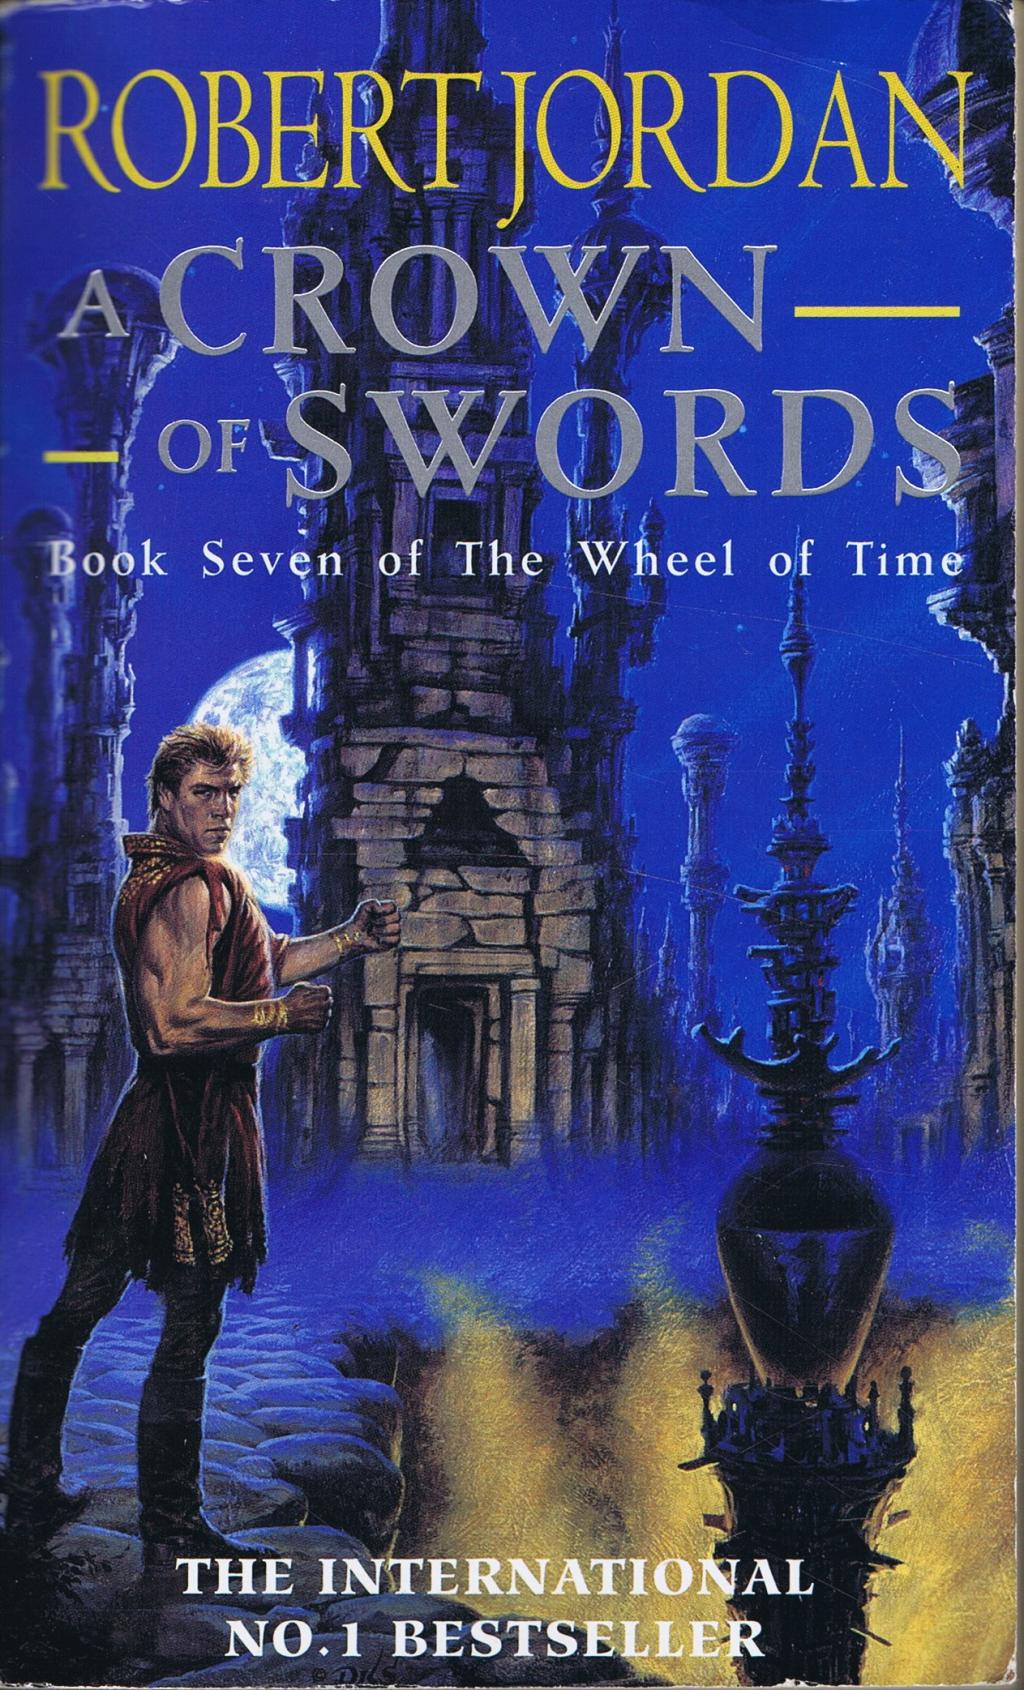 Book review of A Crown Of Swords by Robert Jordan